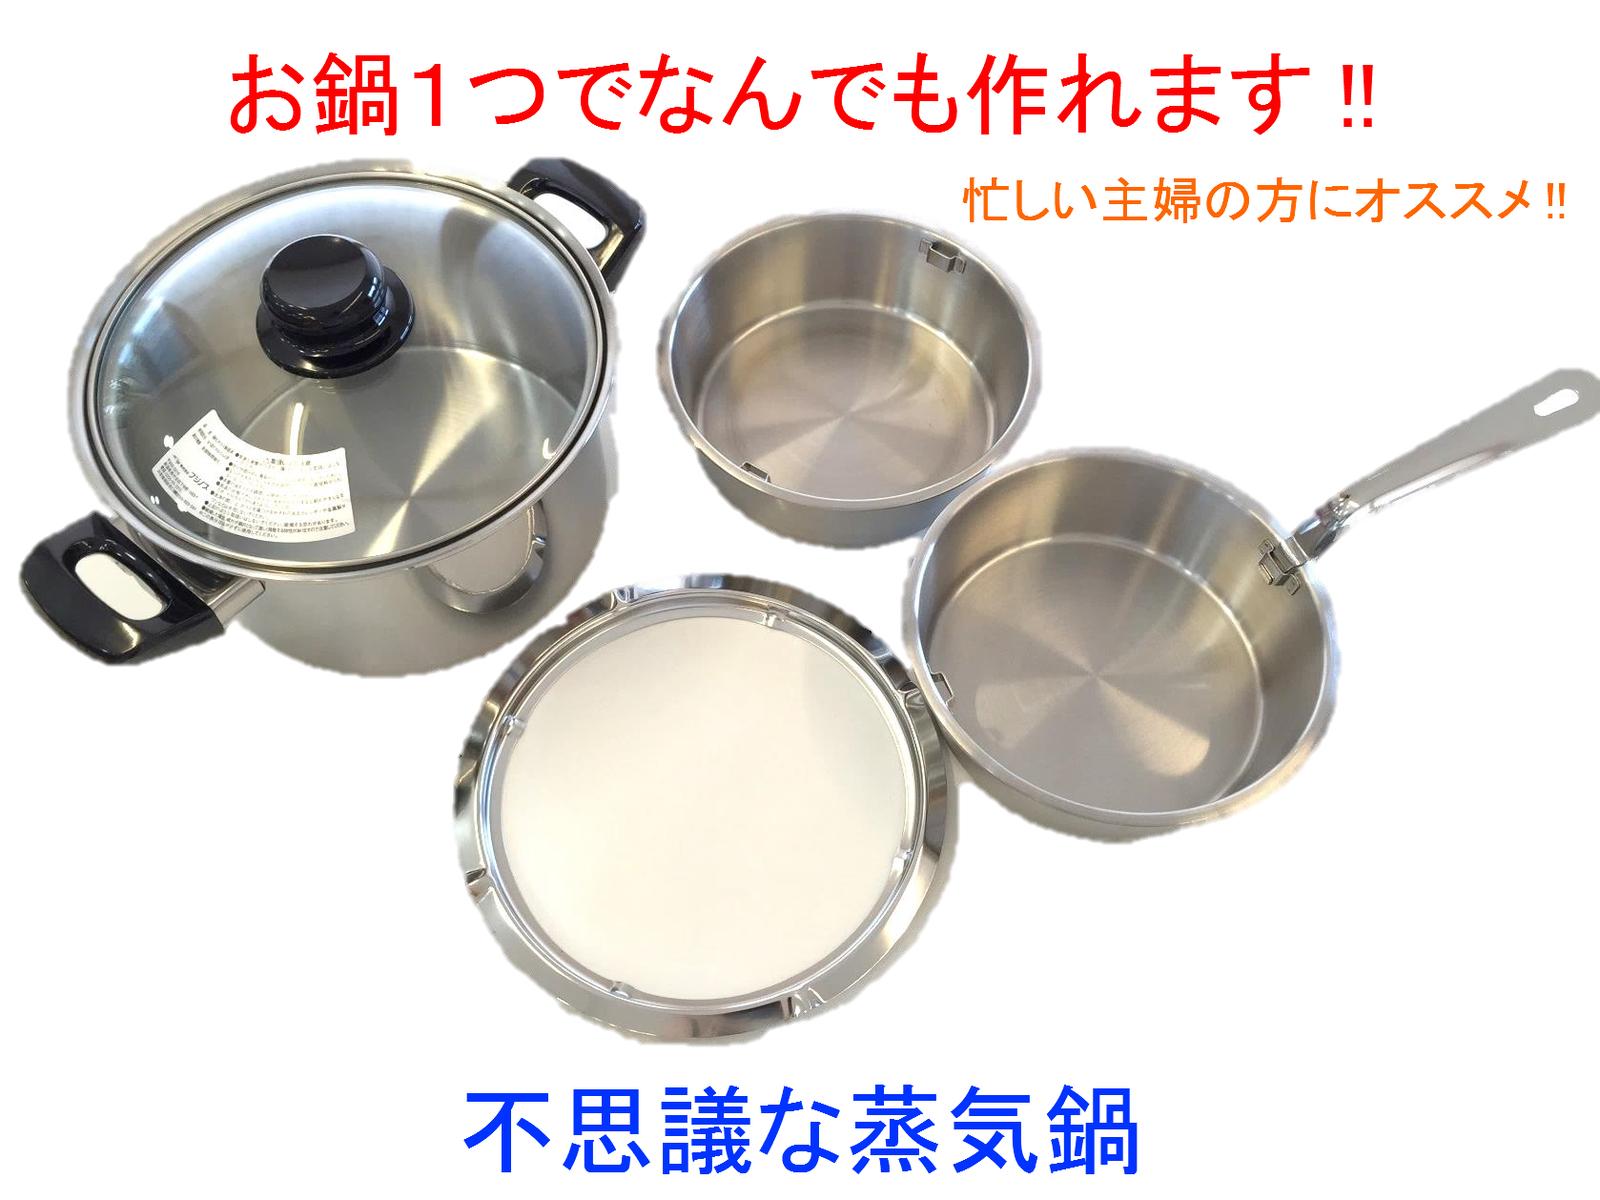 不思議な蒸気鍋